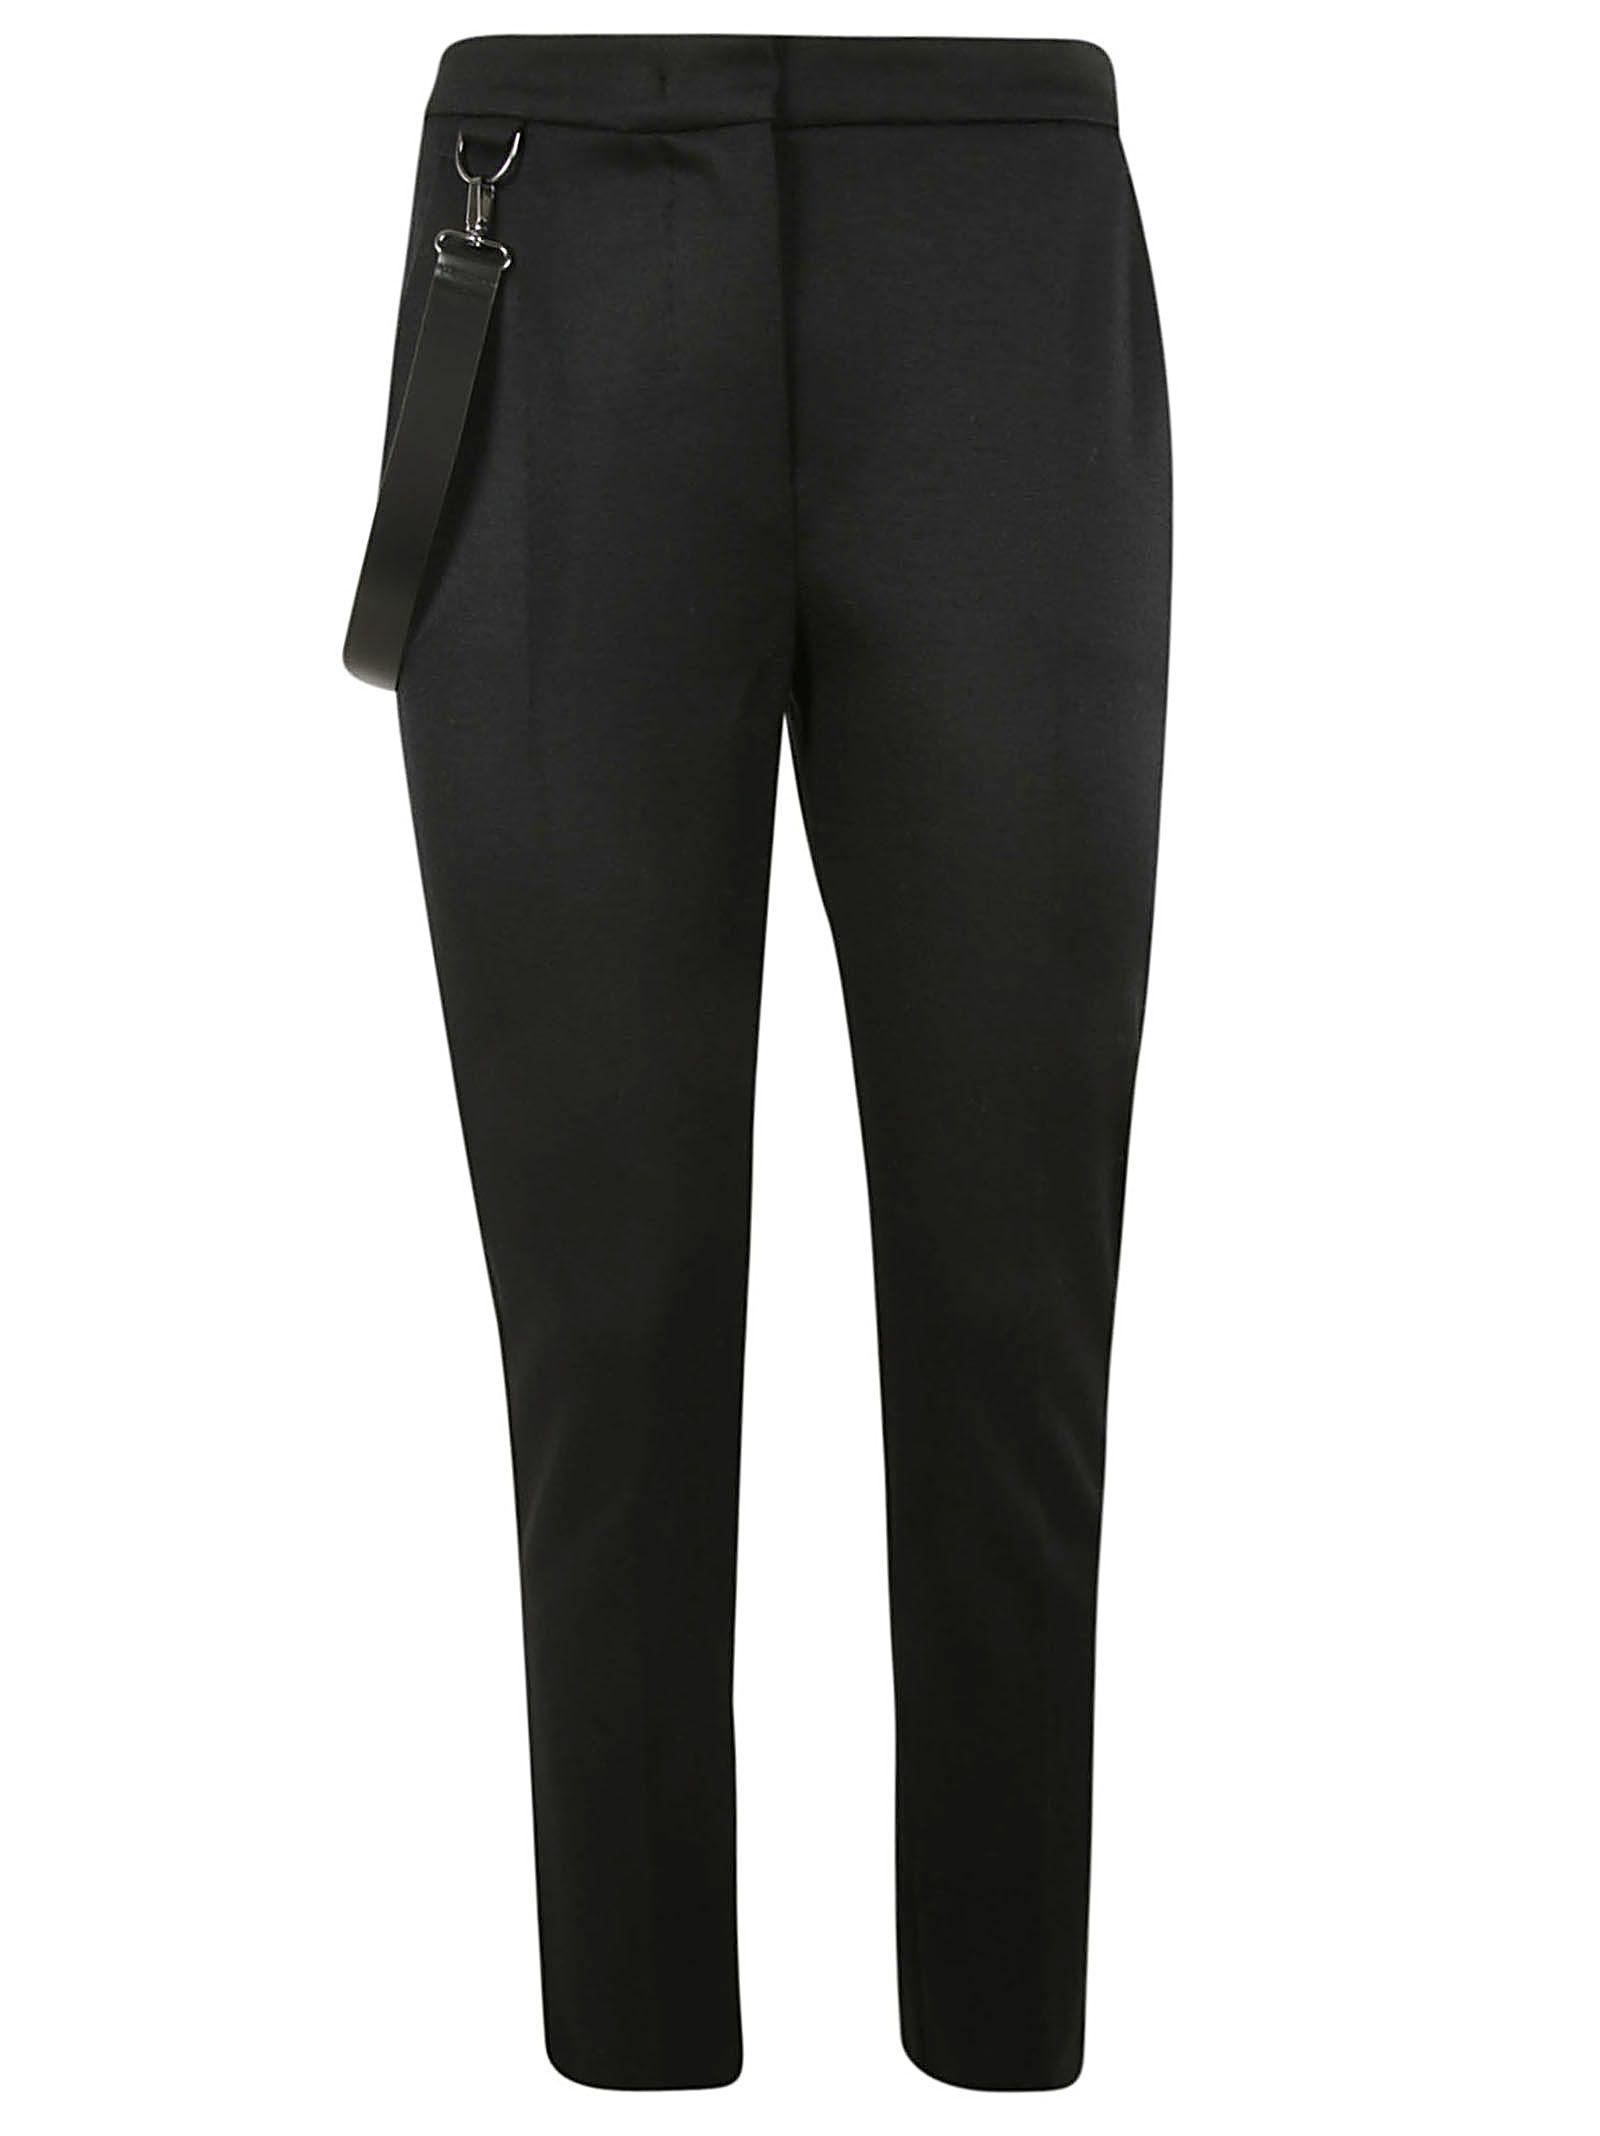 Max Mara High-waisted Slim Trousers